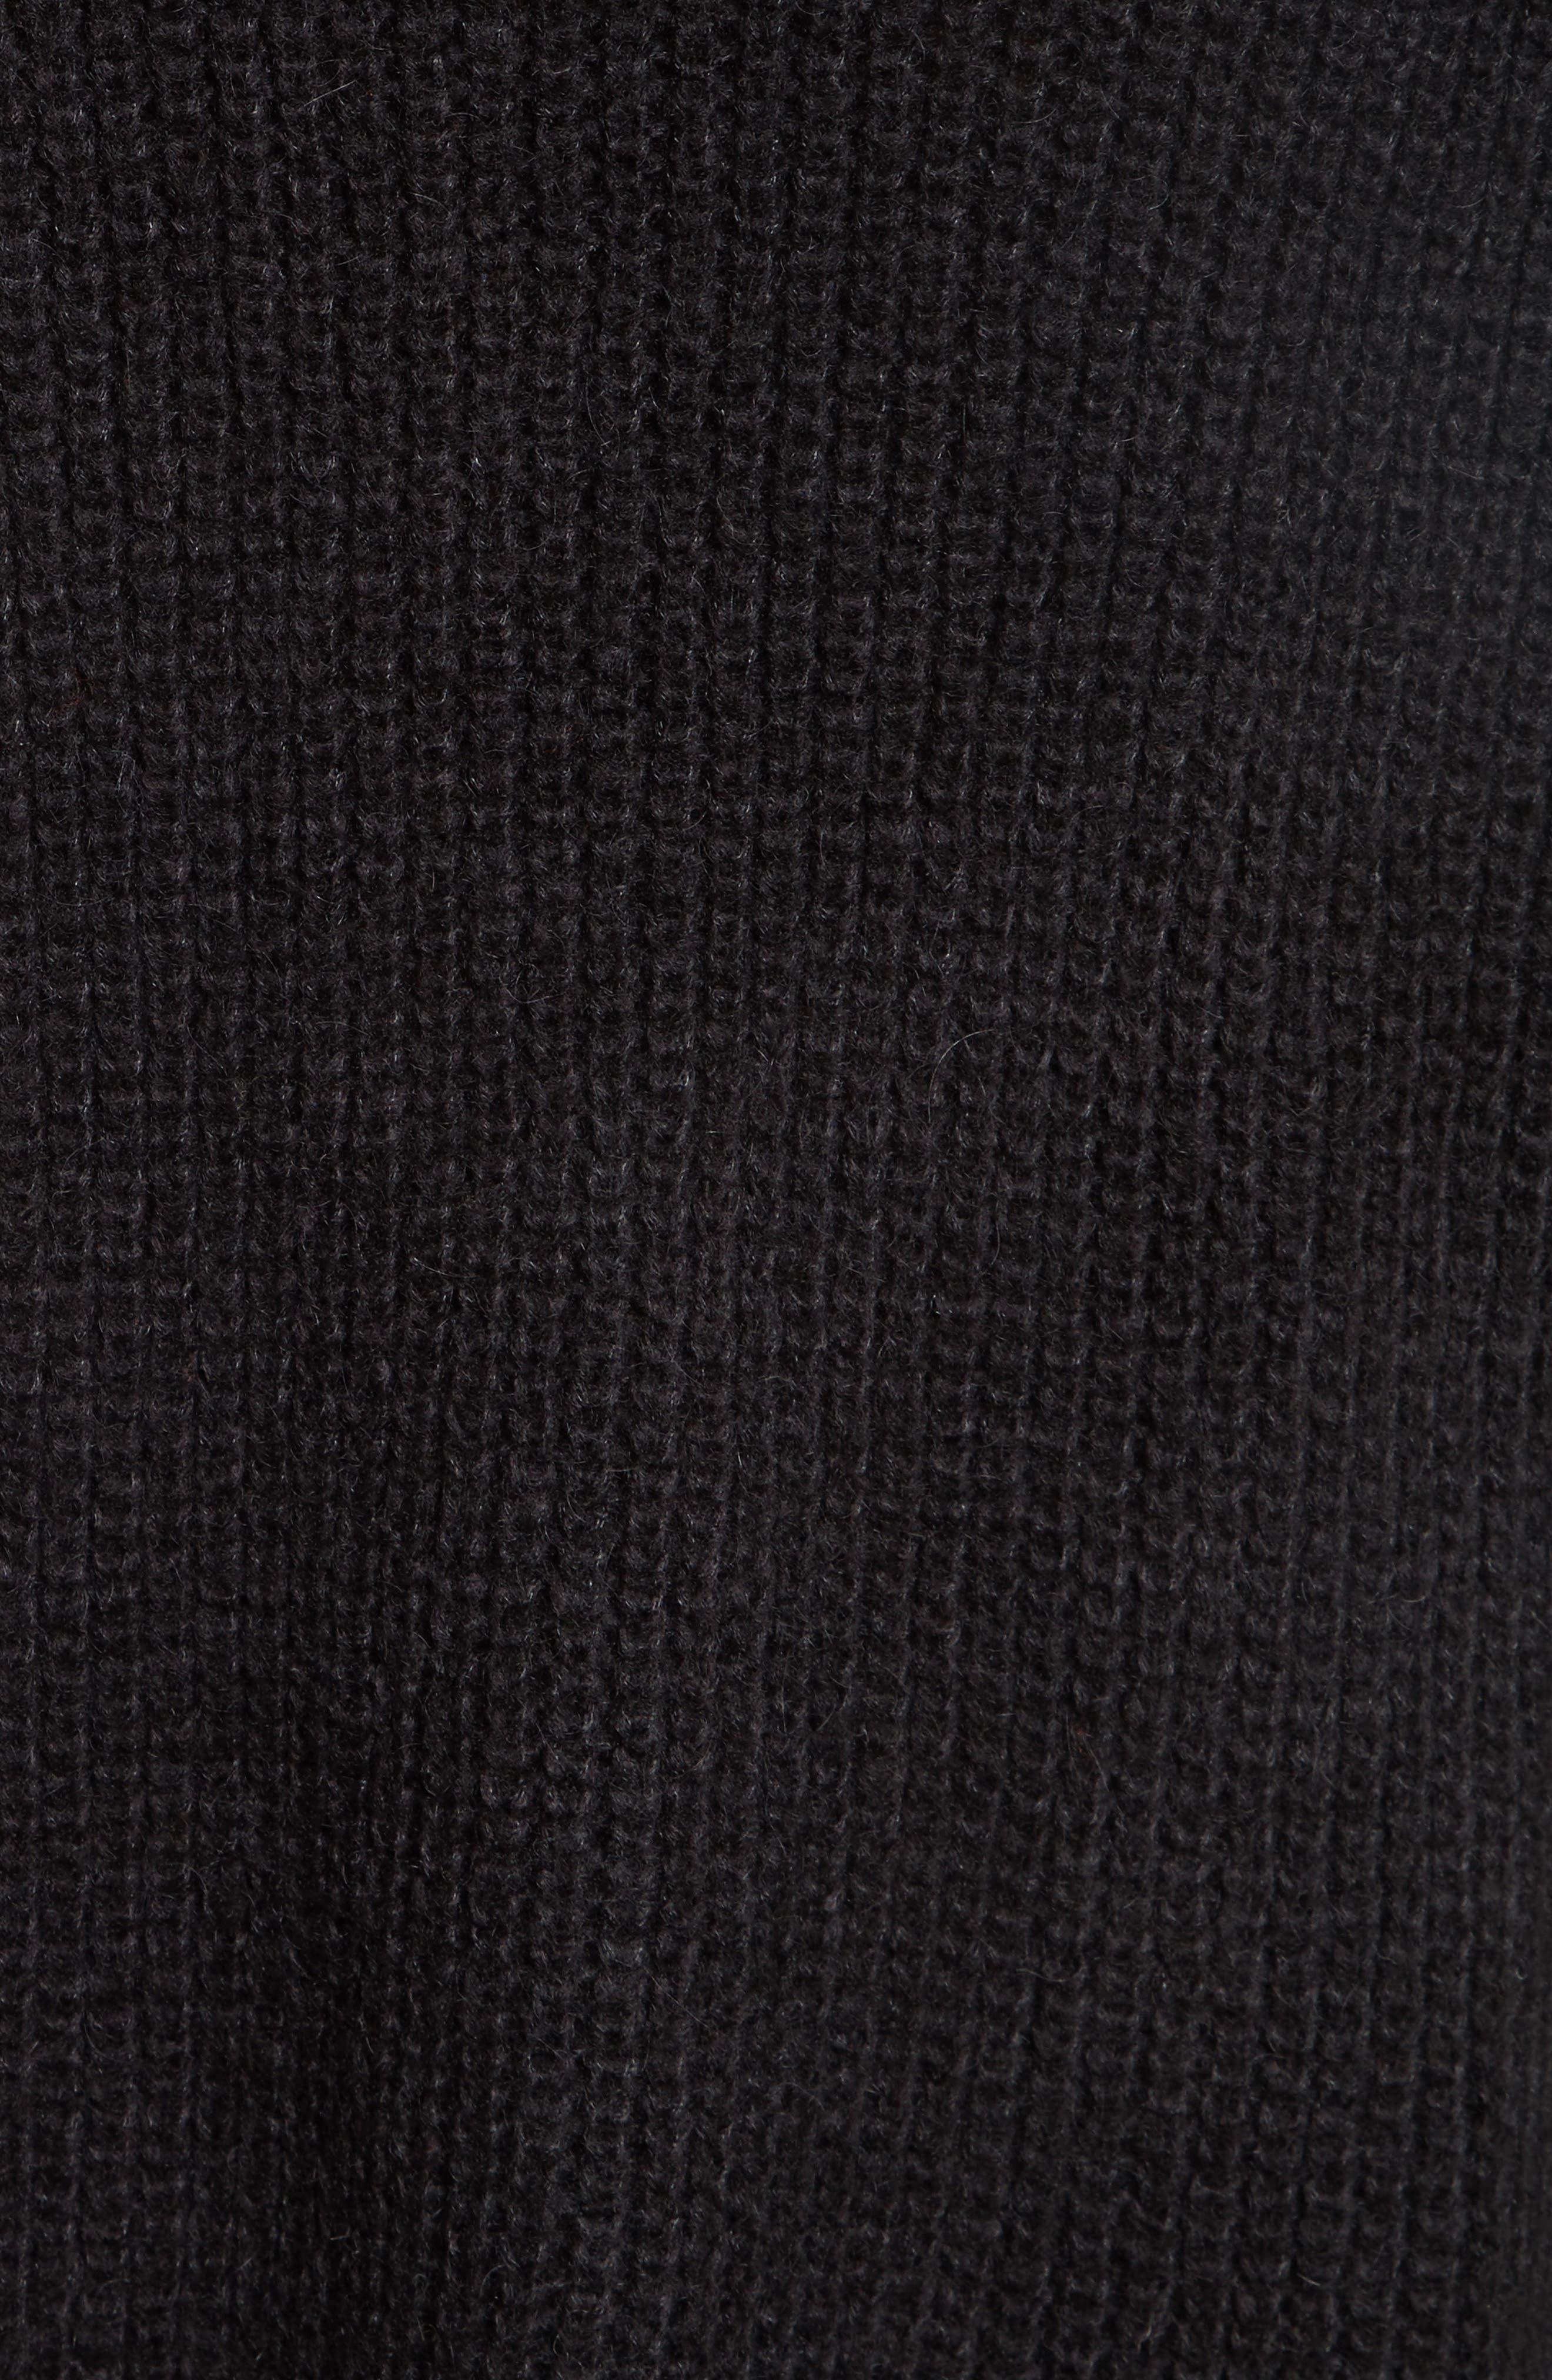 Remi Oversize Sweater,                             Alternate thumbnail 5, color,                             001